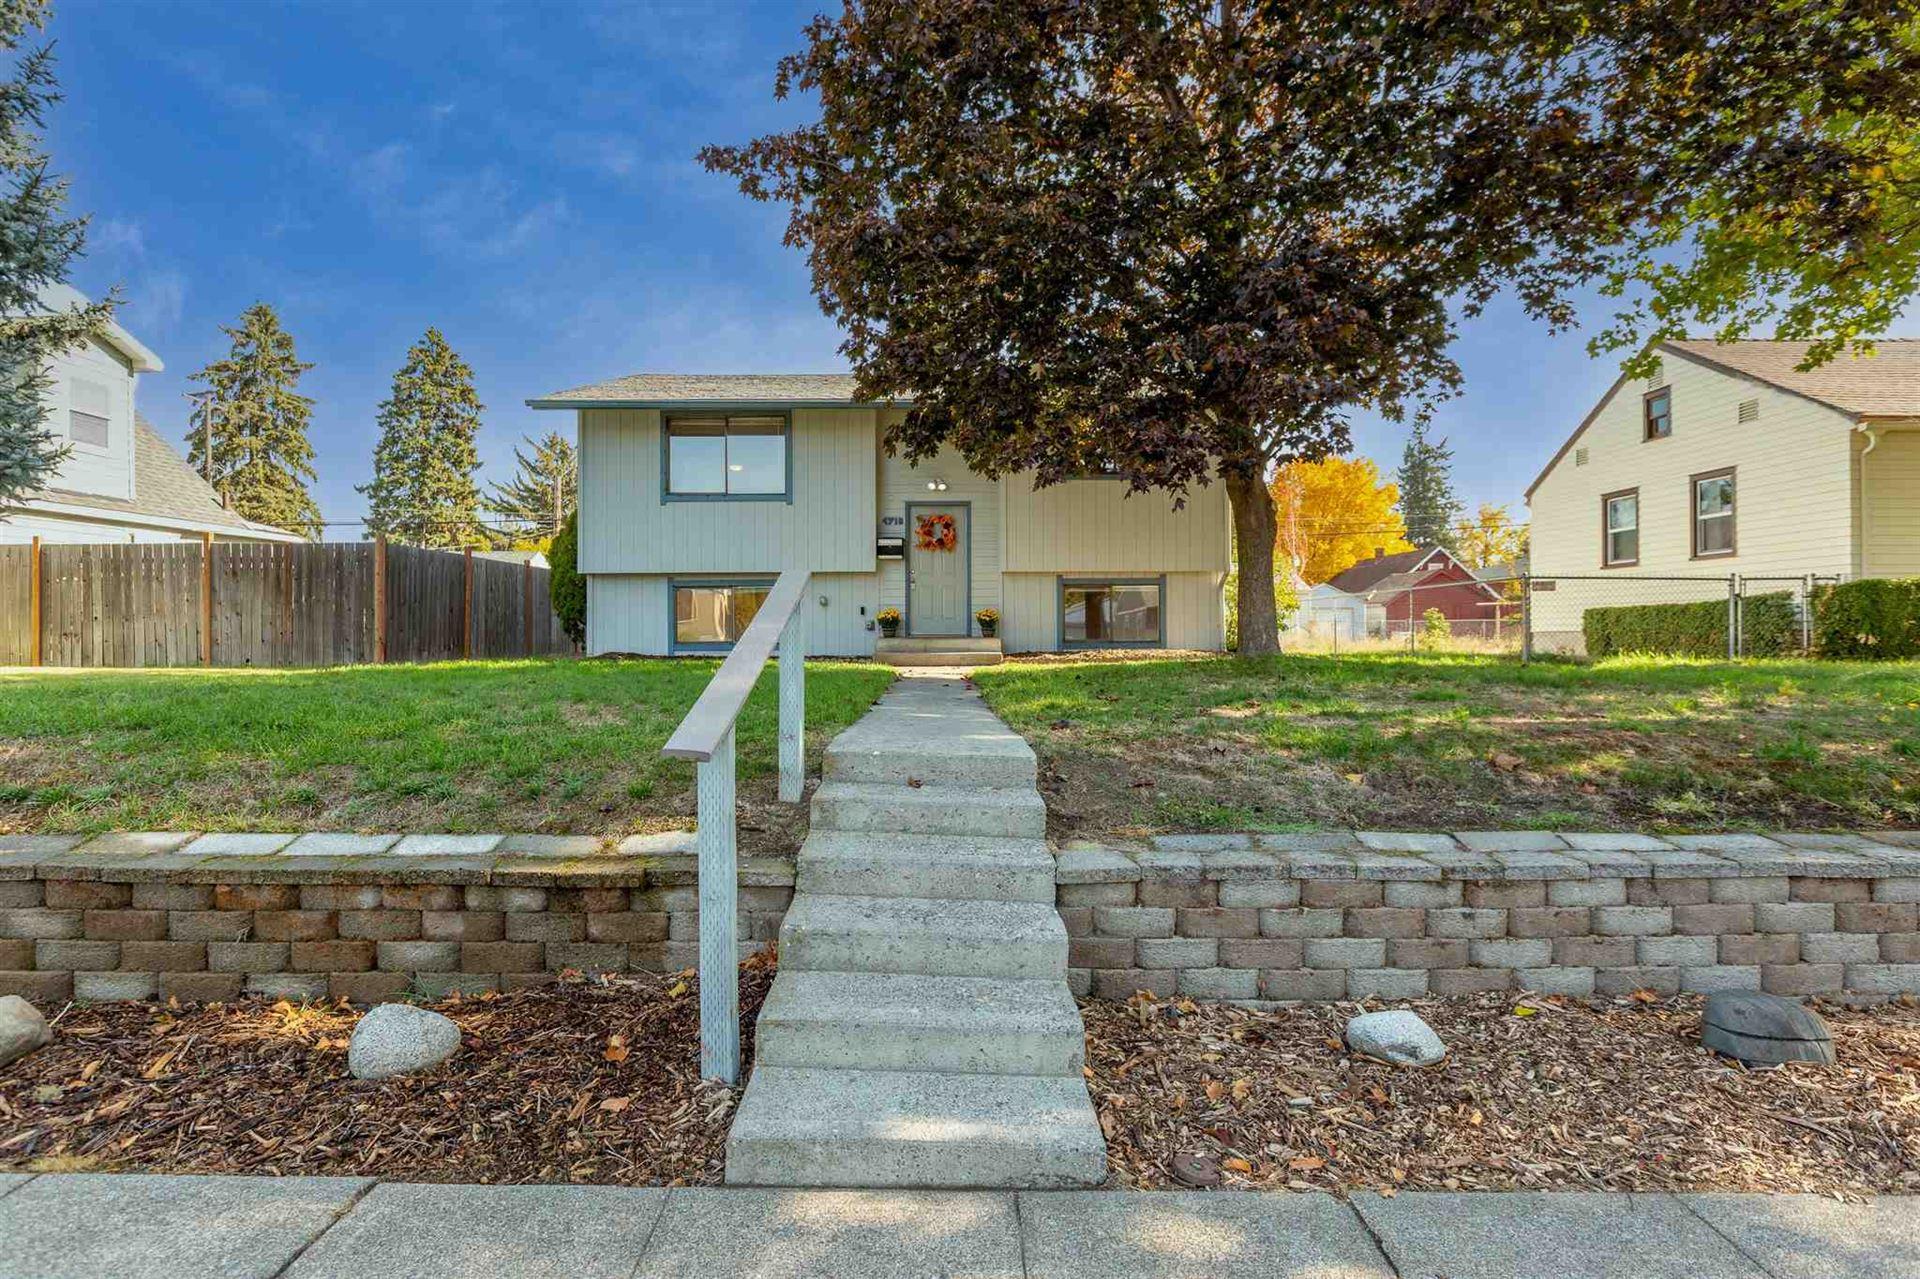 4718 N Hawthorne St, Spokane, WA 99205-5430 - #: 202124166